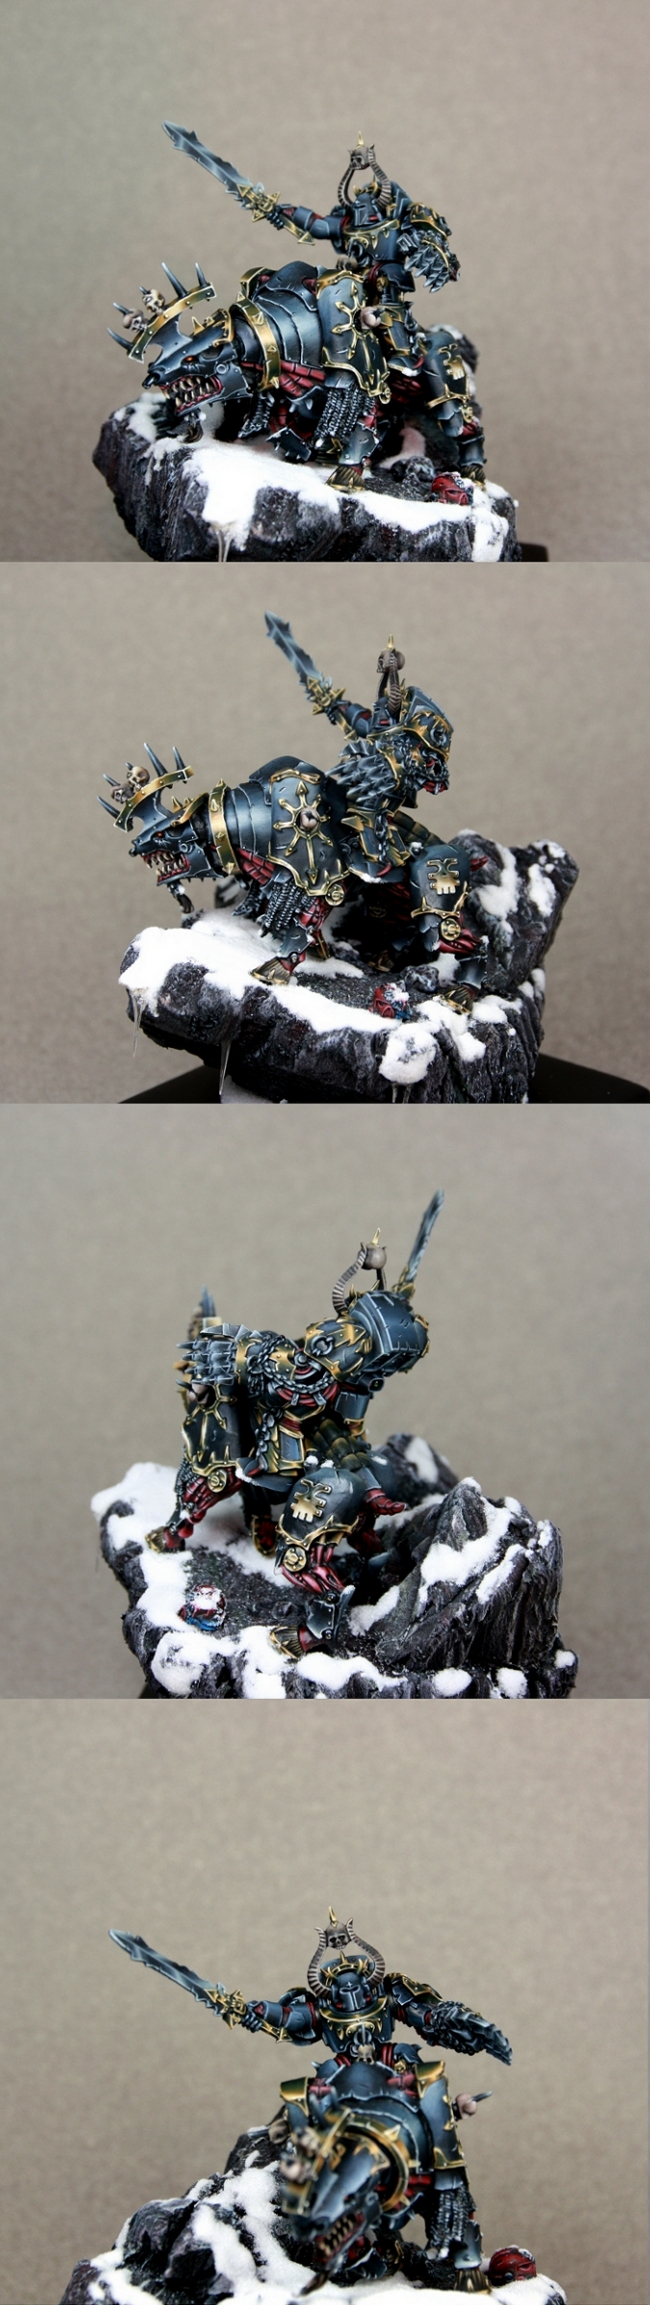 Chaos Lord on Juggernaut